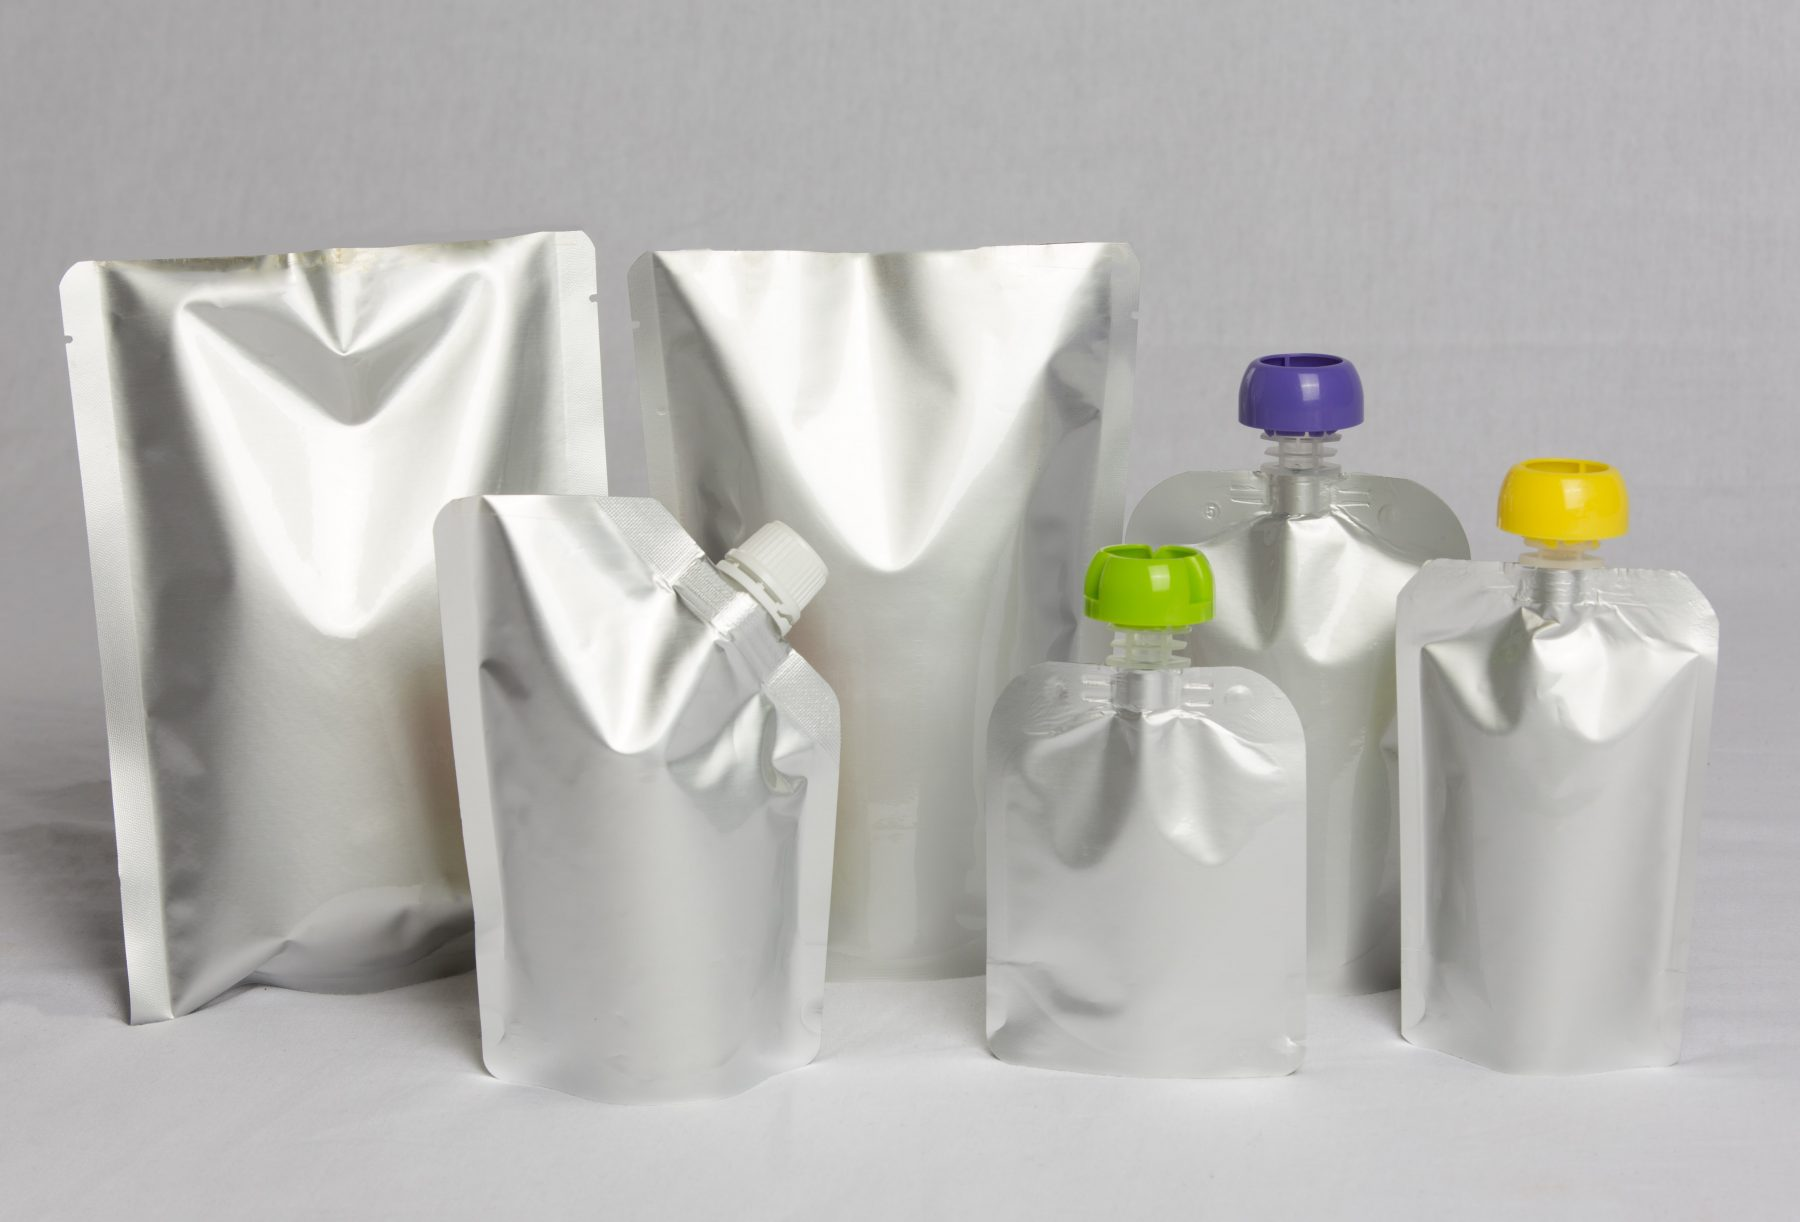 packaging trends, types of flexible packaging